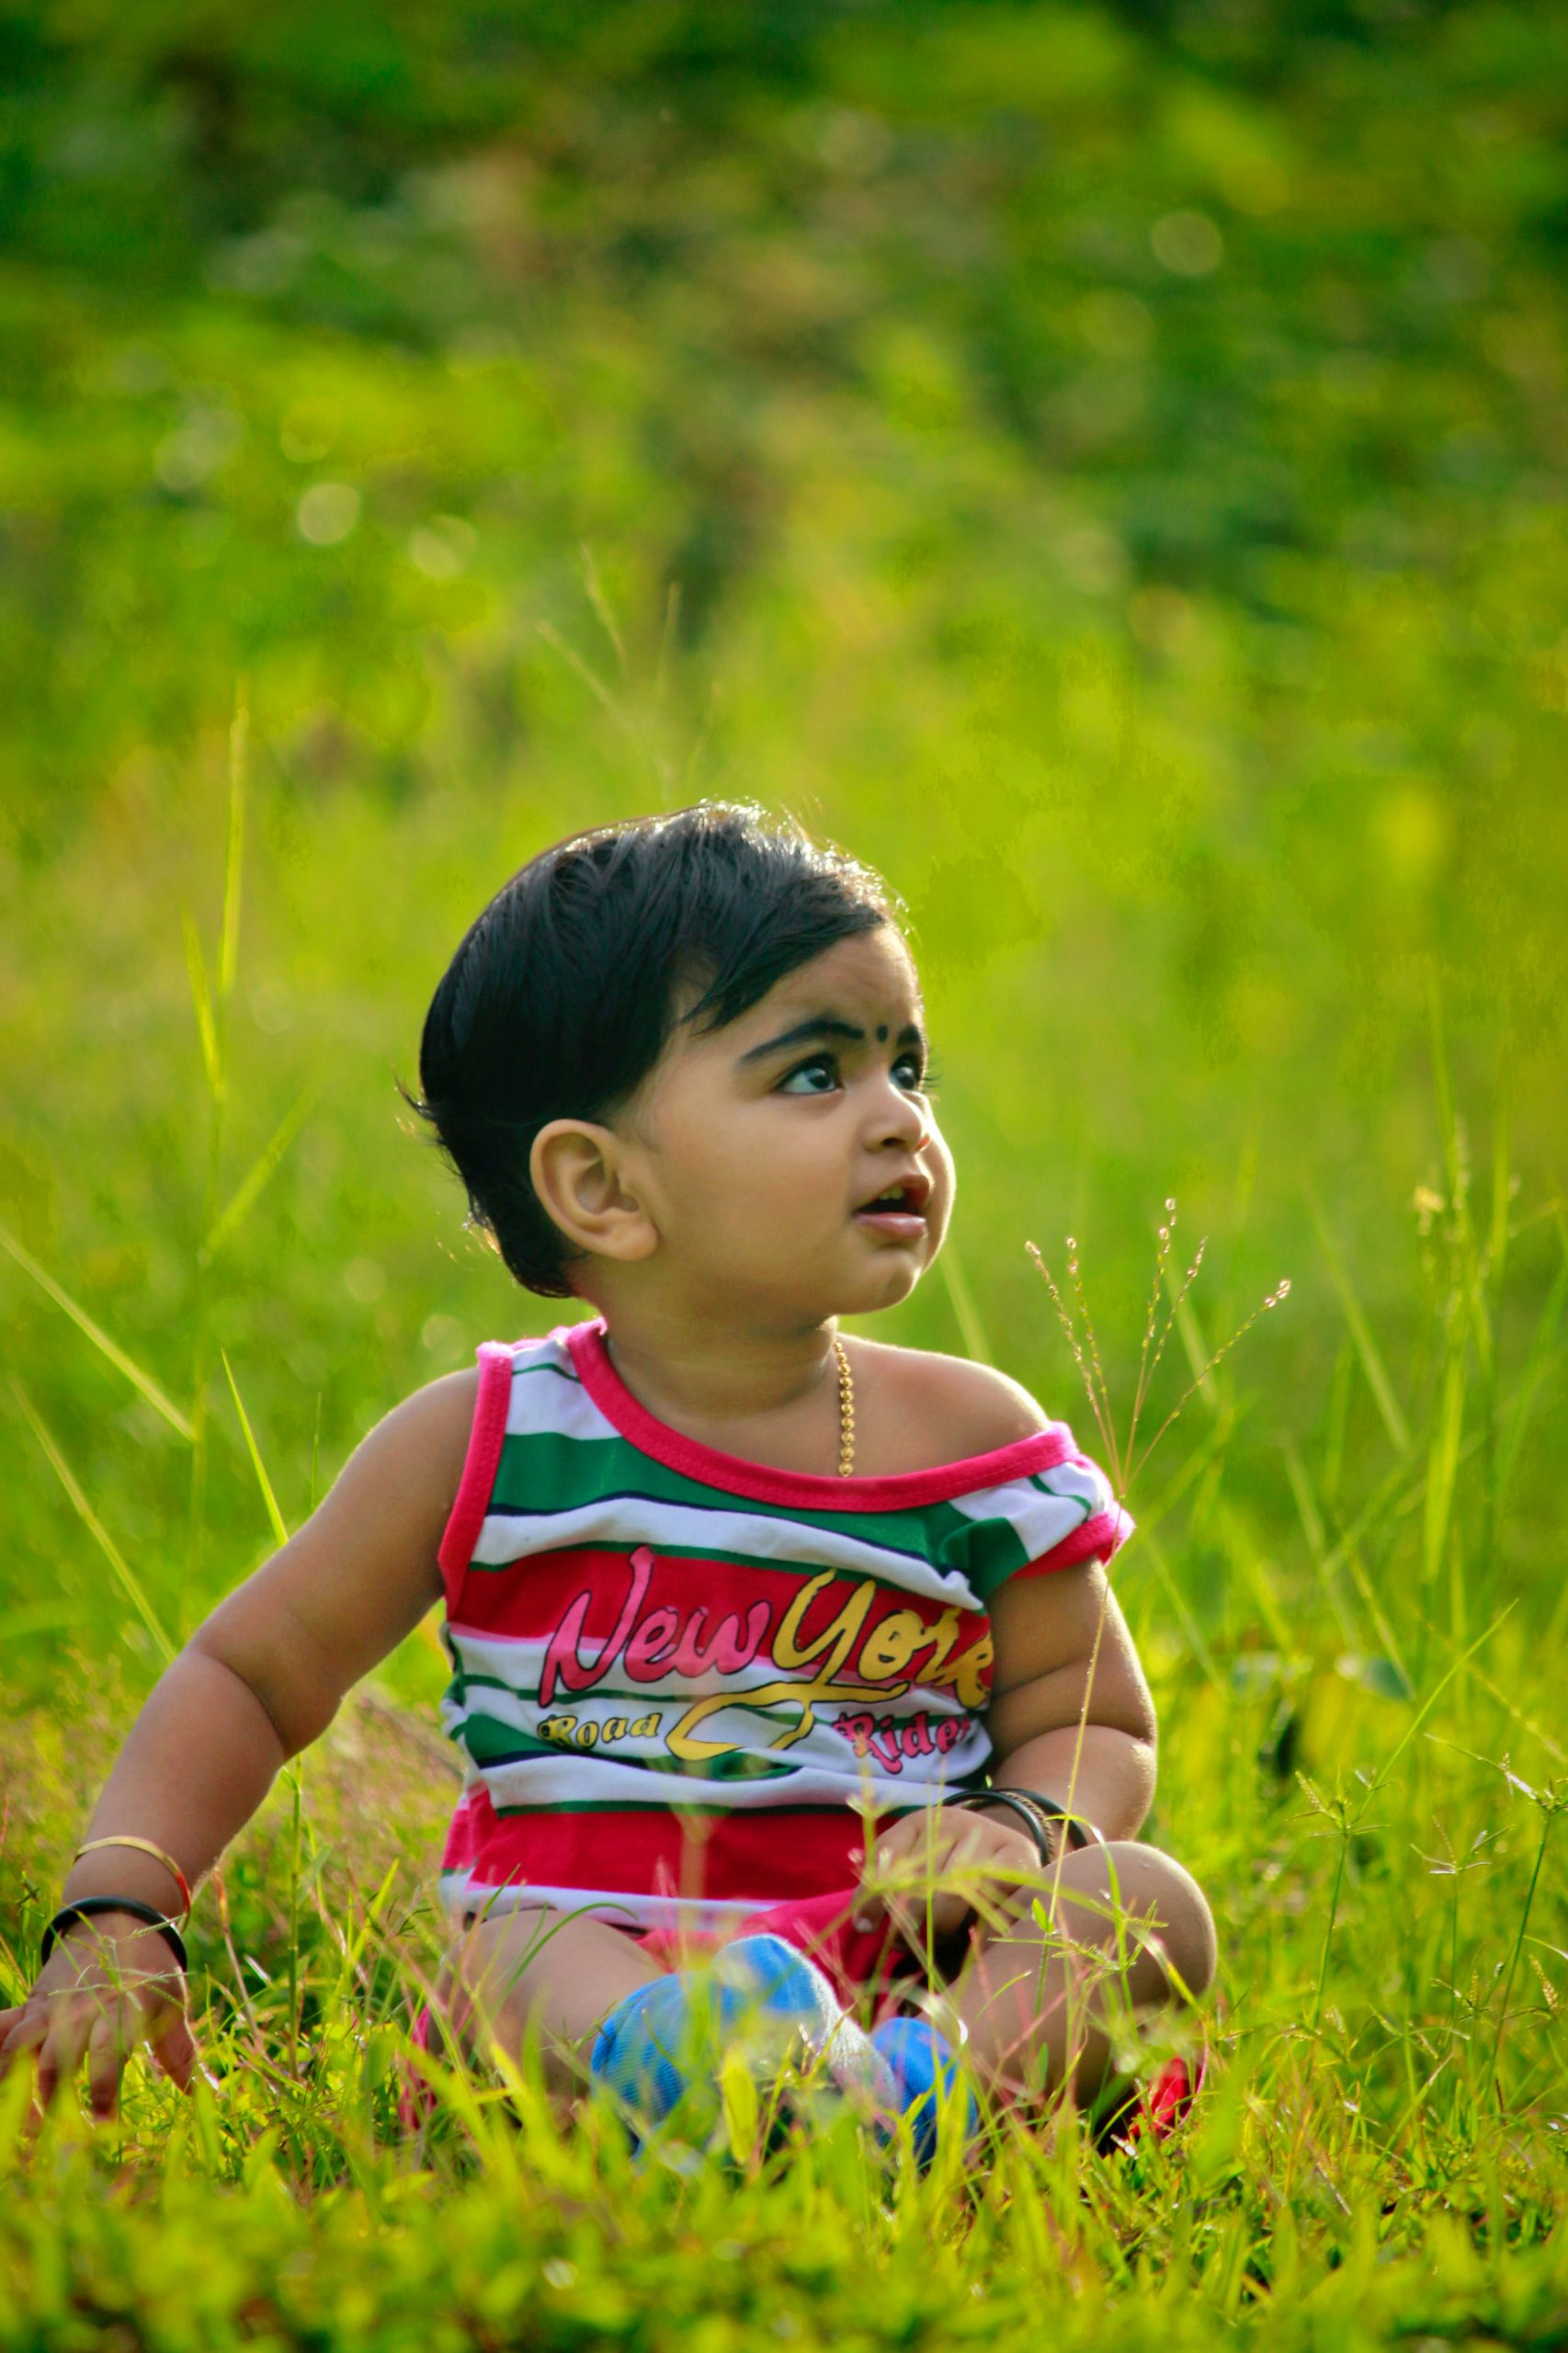 New Stylish Baby Boy Whatsapp Dp Images pic photo hd